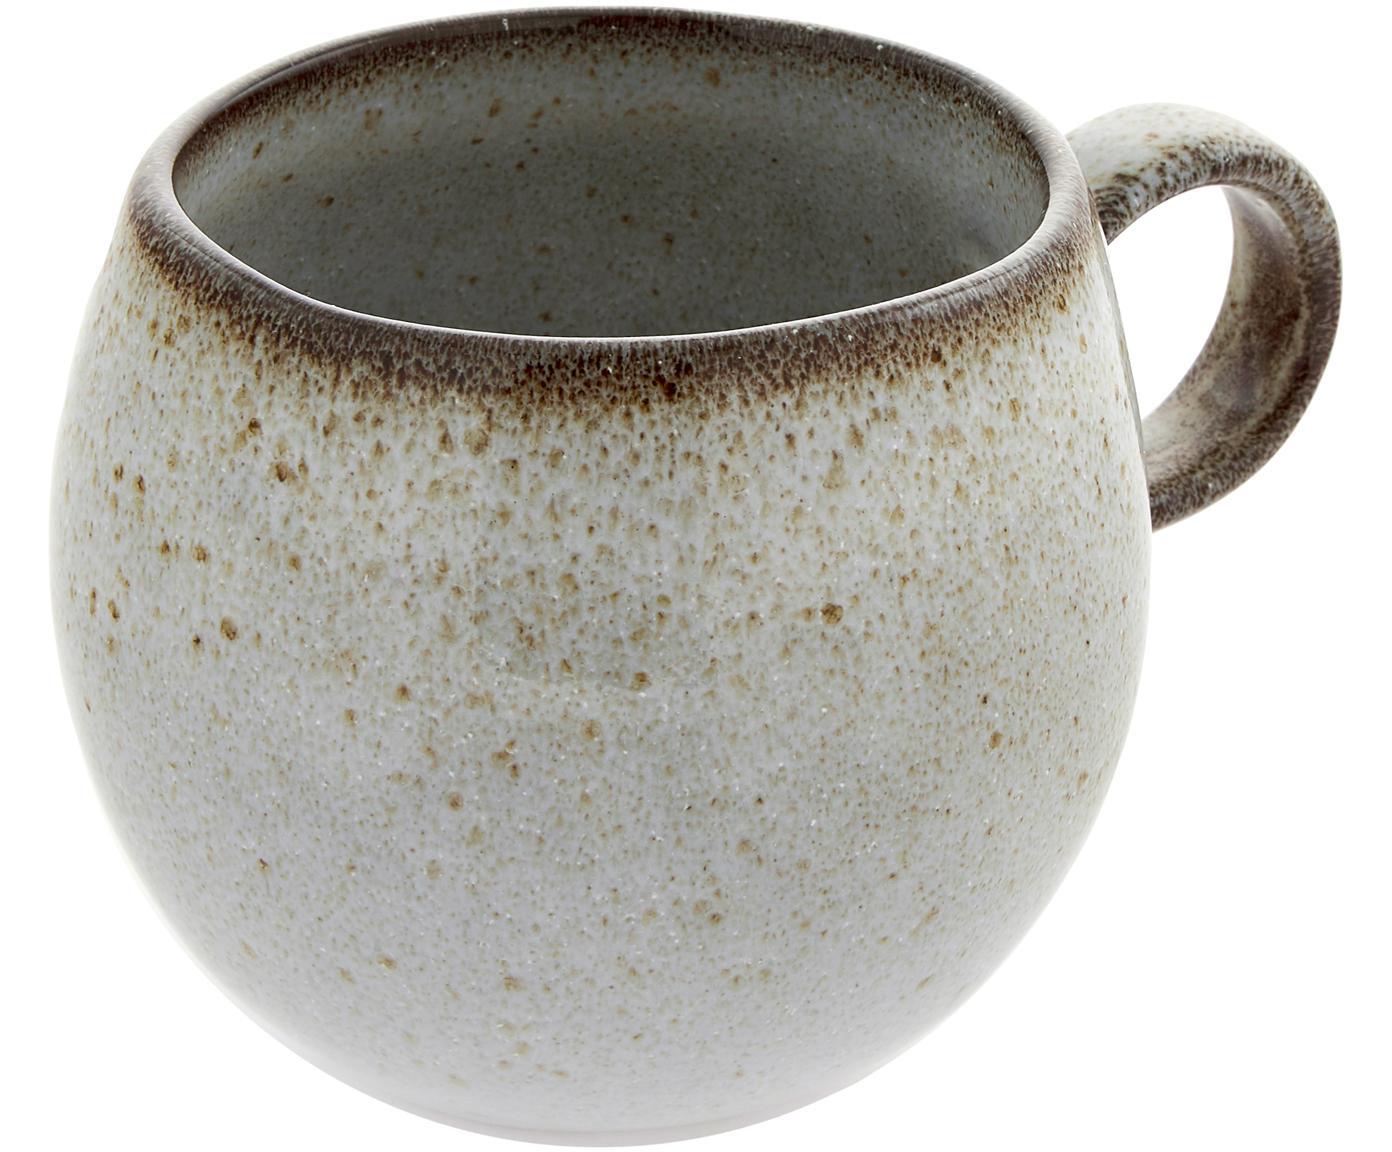 Handgemaakte mok Sandrine, Keramiek, Lichtgrijs, Ø 10 x H 10 cm